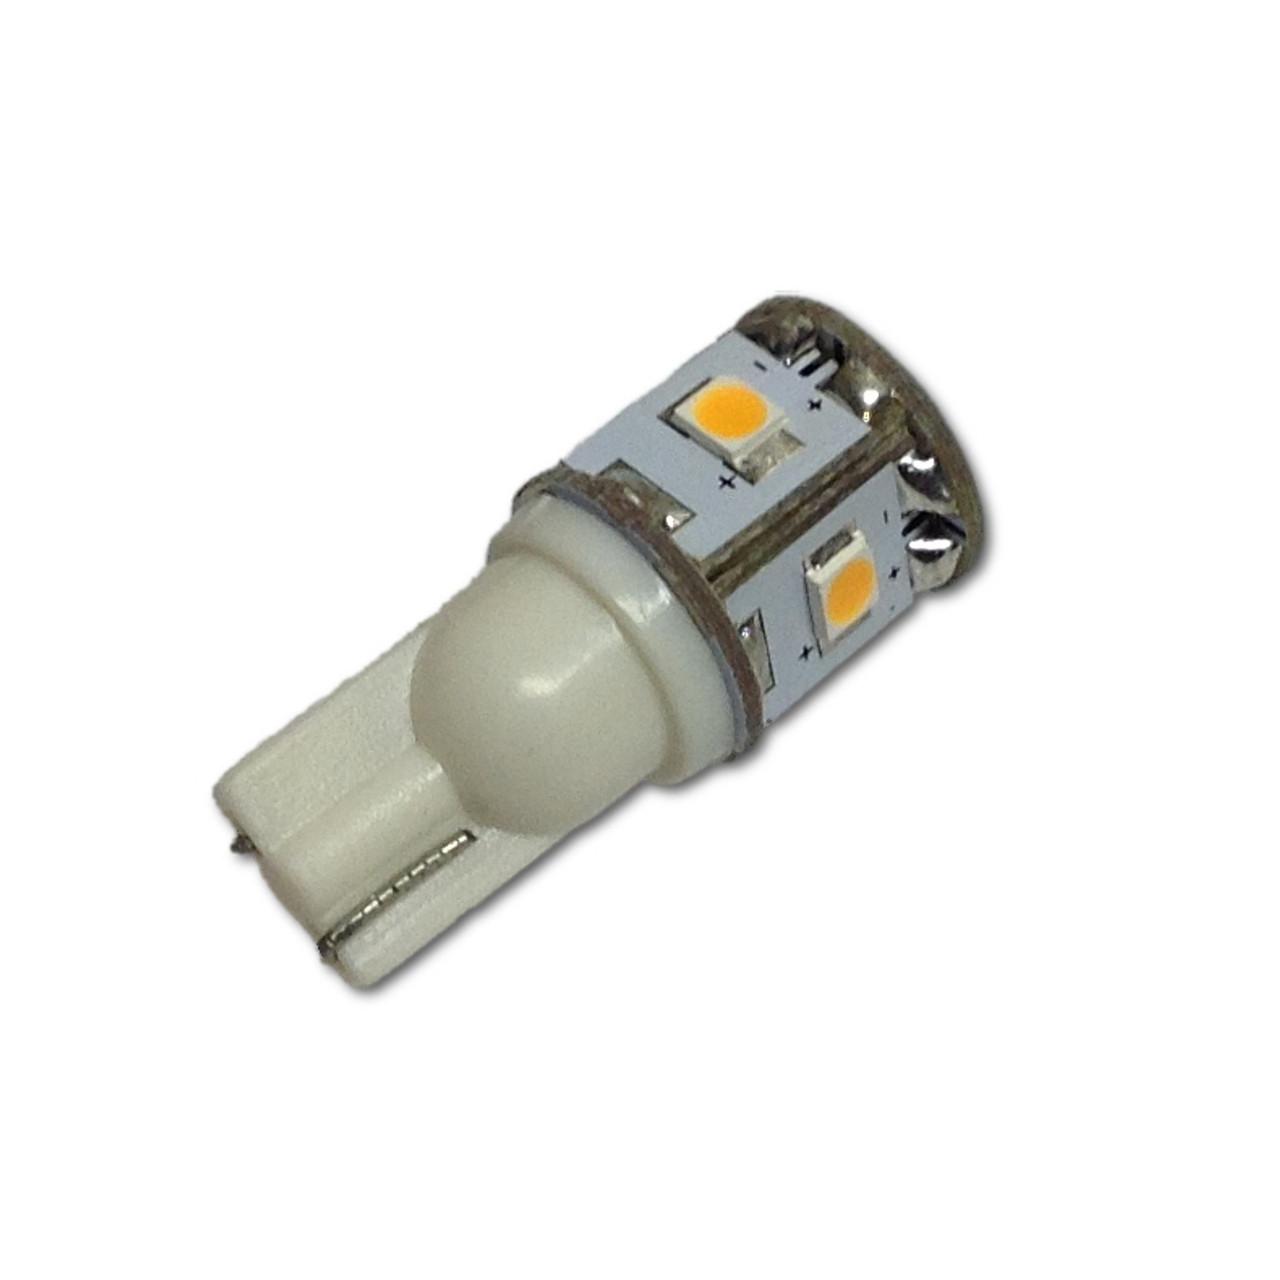 Unbreakable plastic base and 10-30VDC input range